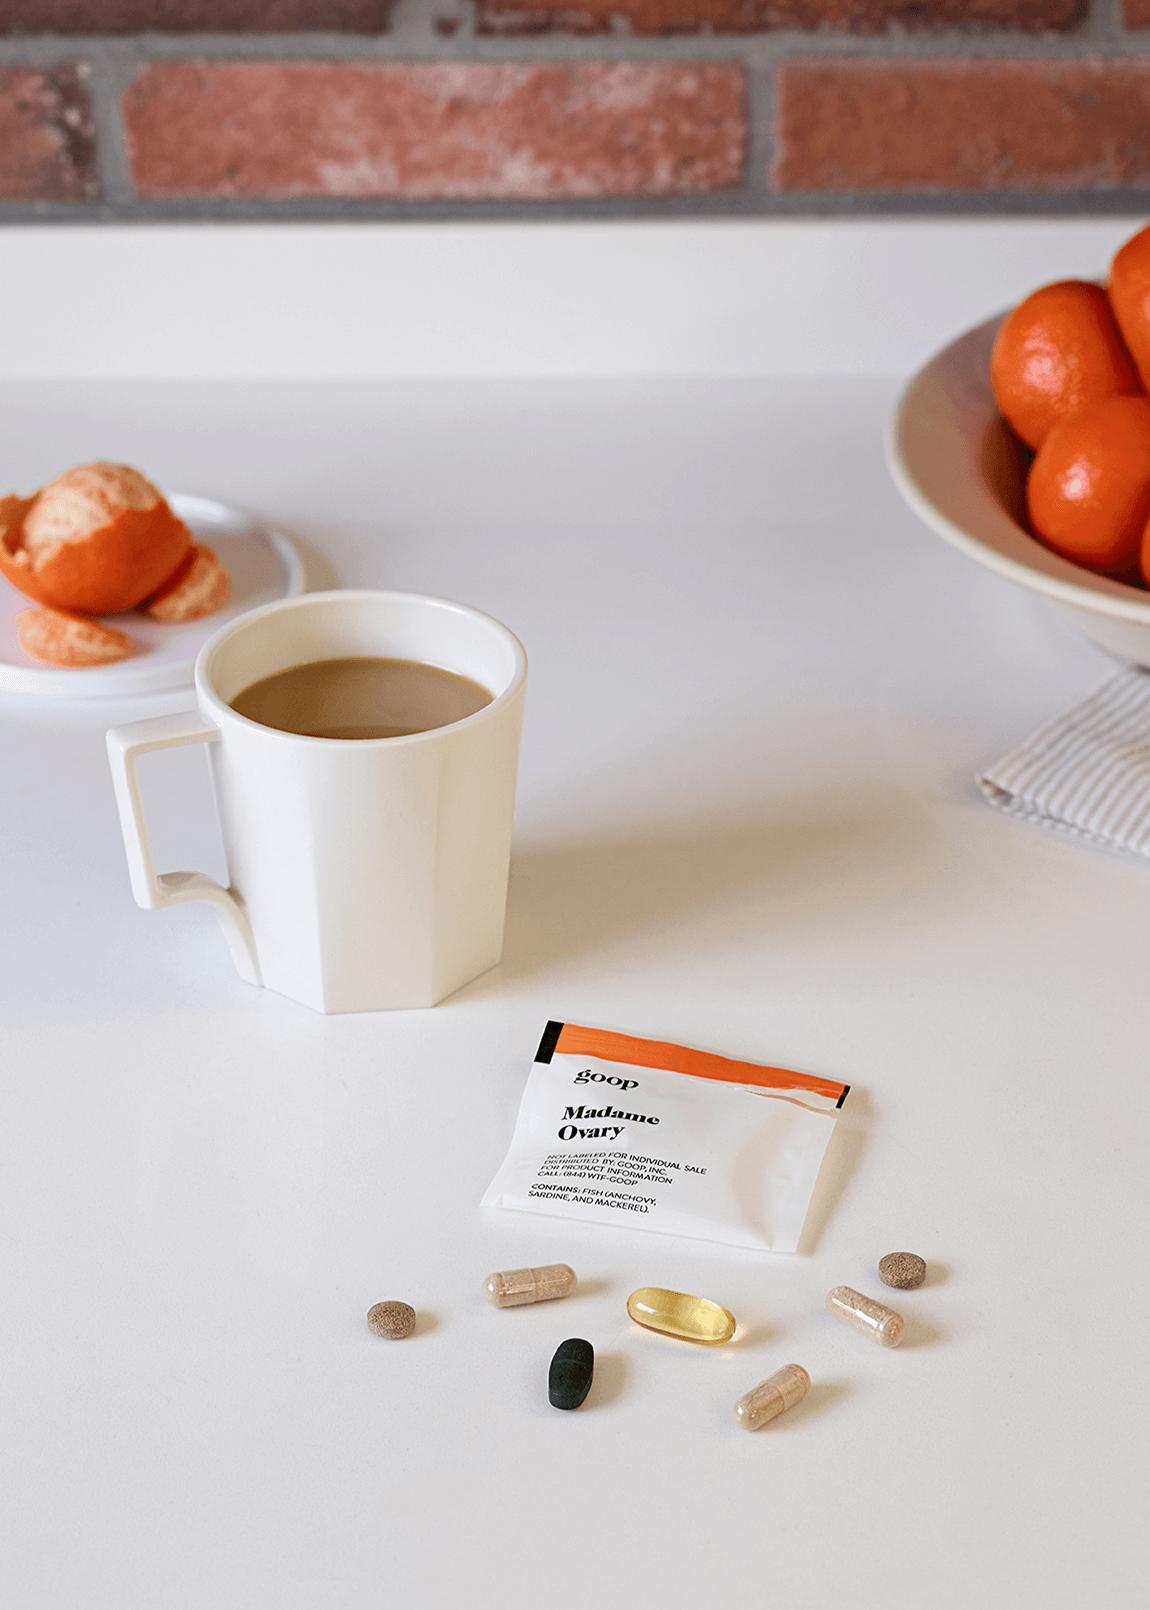 Madame Ovary Vitamin Subscription